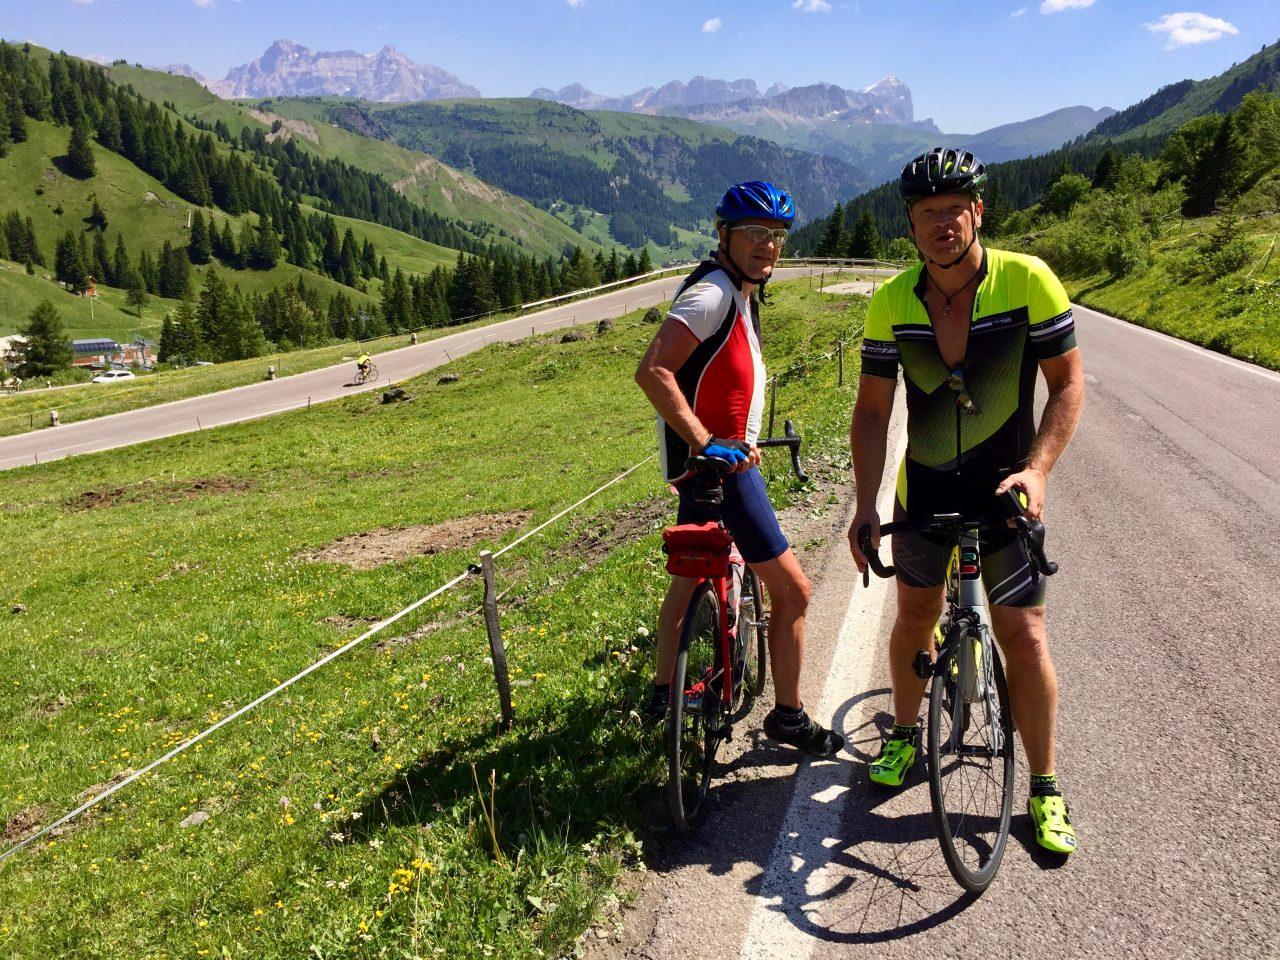 Hans-Jörg u. Andi, Auffahrt Passo Pordoi, Dolomites, Italy